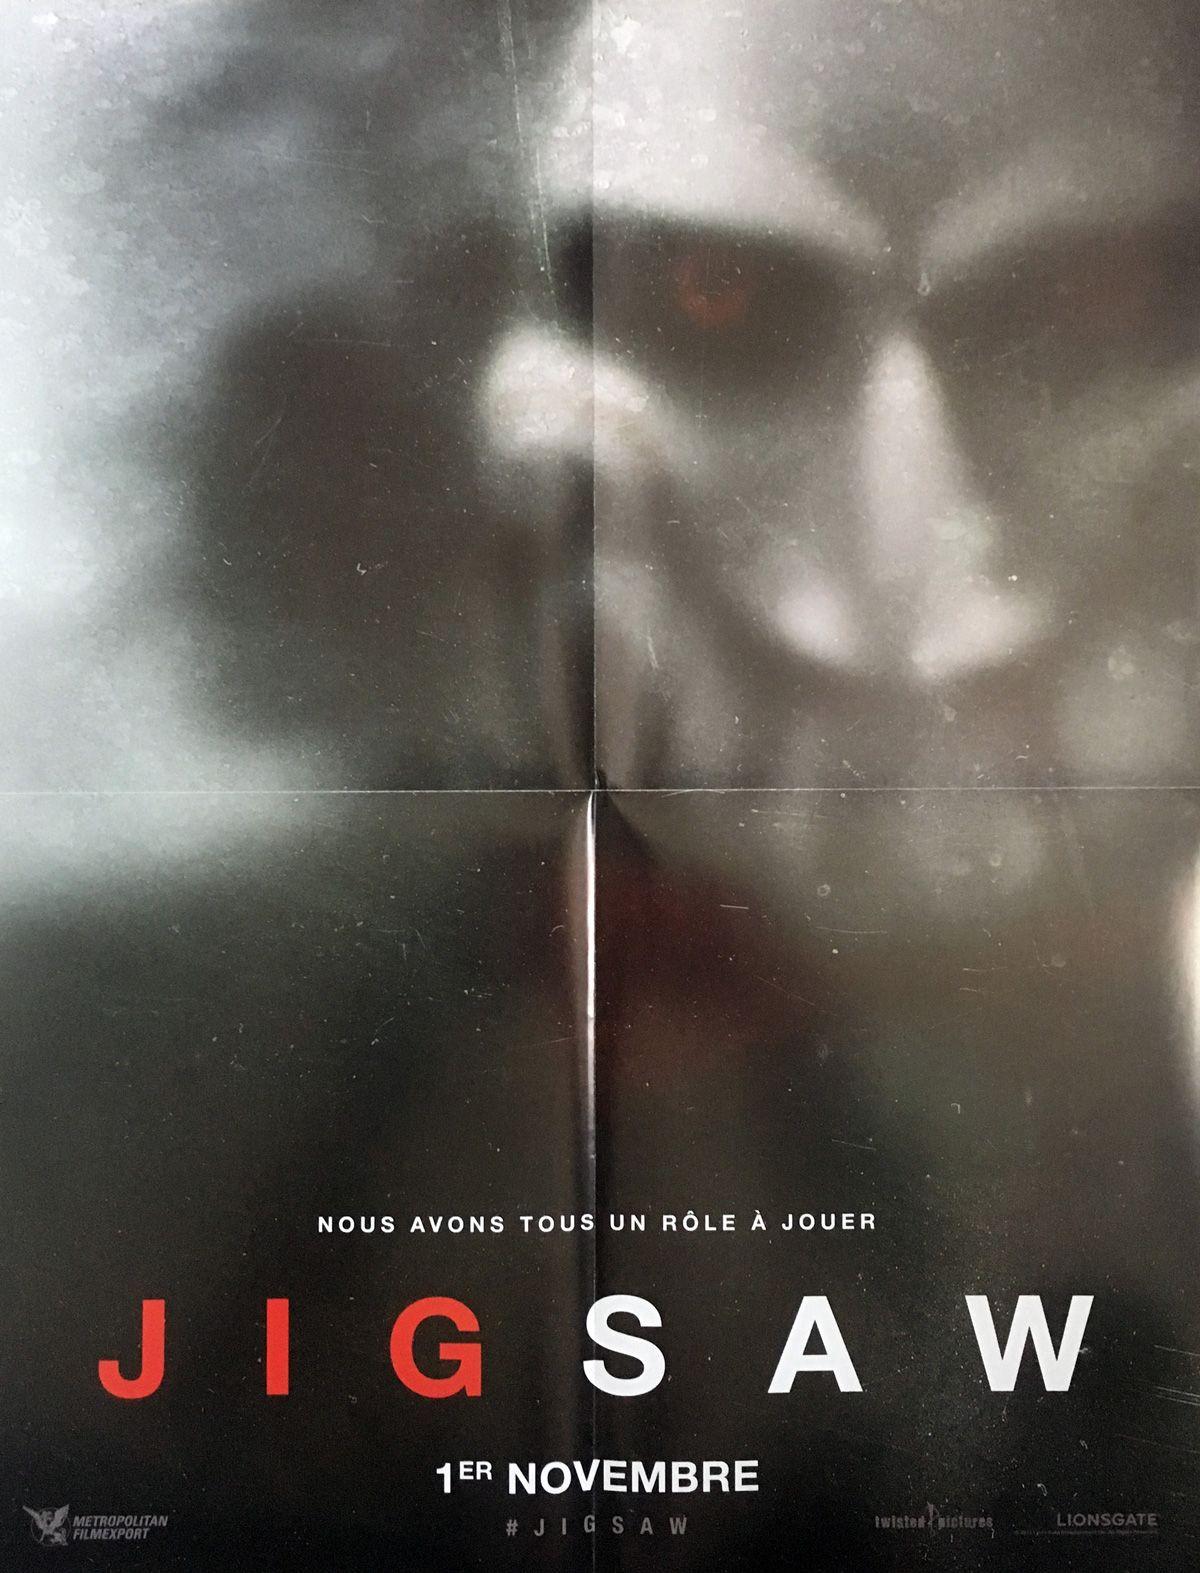 watch jigsaw (2017) movie online [full-hd@1080p] streaming free